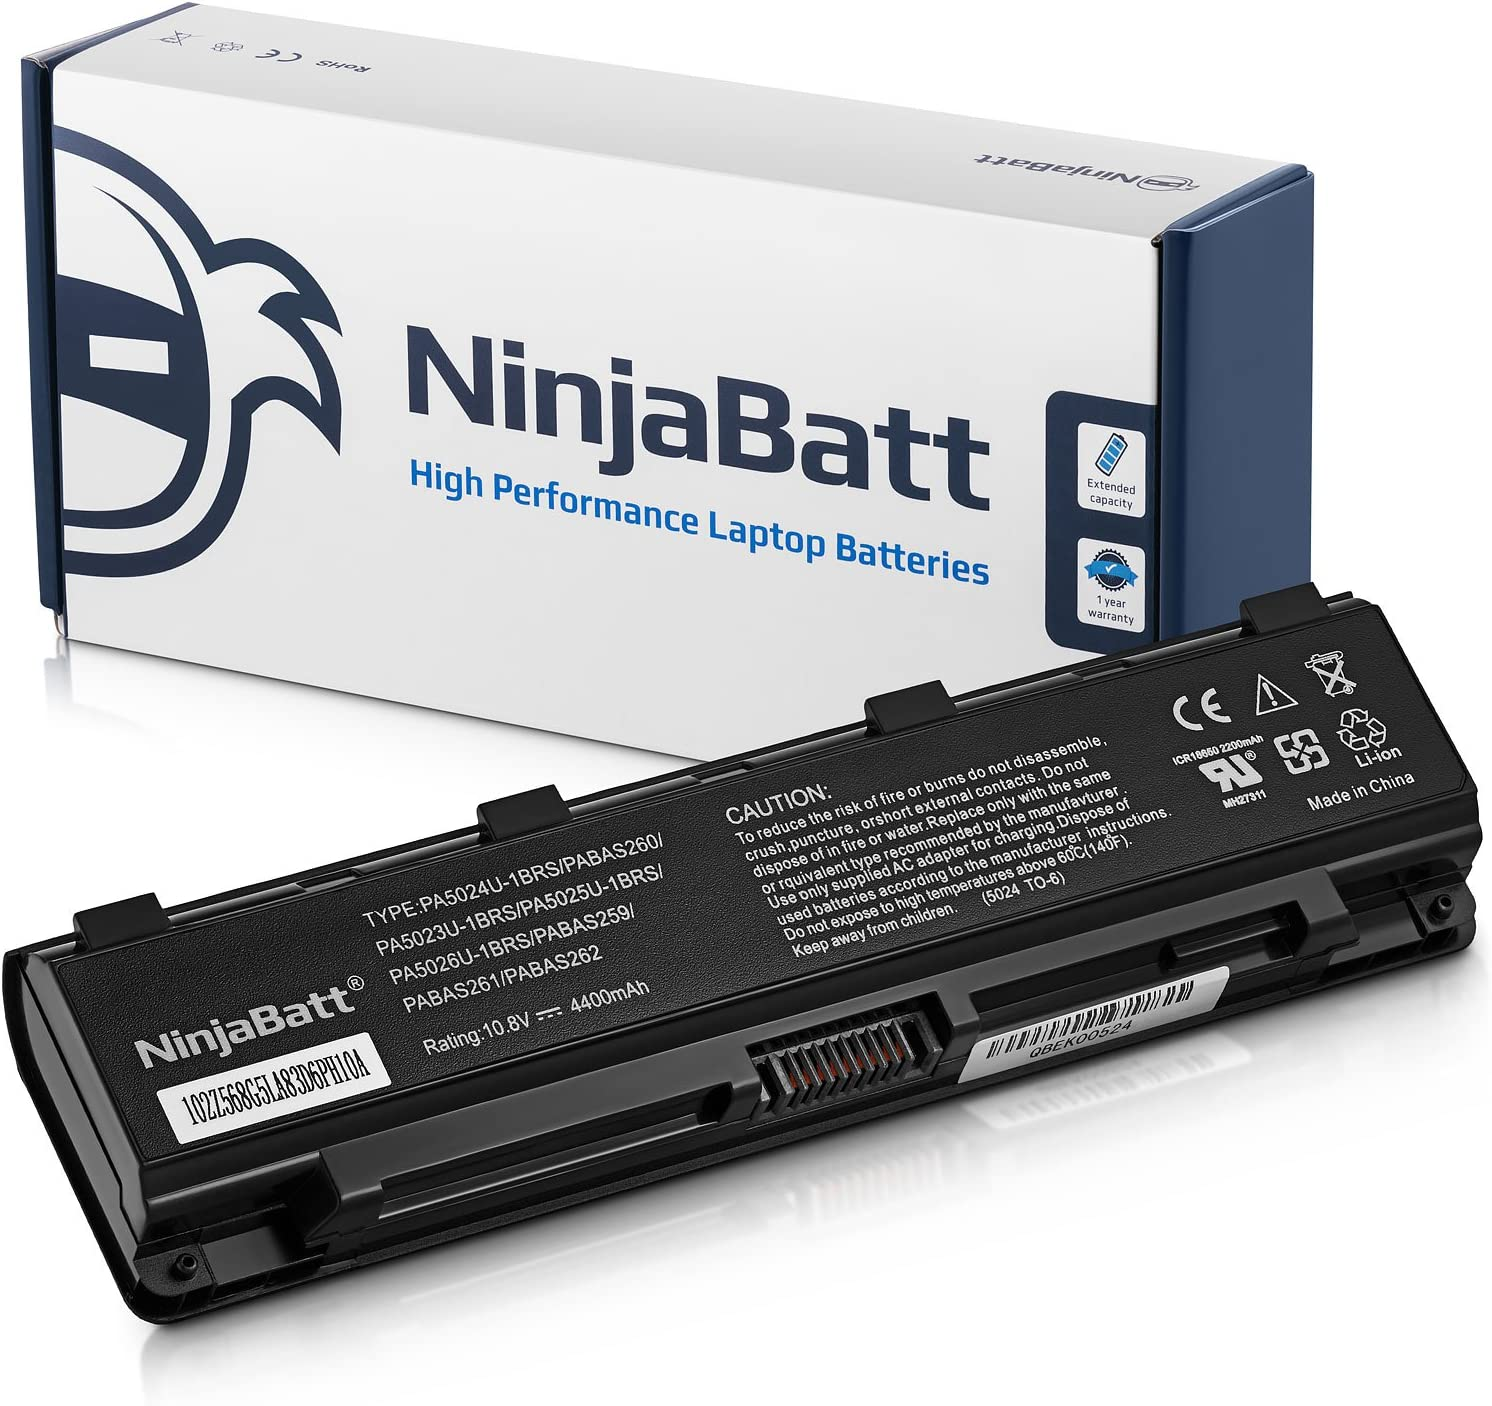 NinjaBatt Laptop Battery for Toshiba PA5024U-1BRS PA5026U-1BRS PA5025U-1BRS PABAS260 PA5023U-1BRS PABAS262 PA5027U-1BRS Satellite C850 C855 L850 P850 PABAS259 - High Performance [6 Cells/4400mAh/48wh]